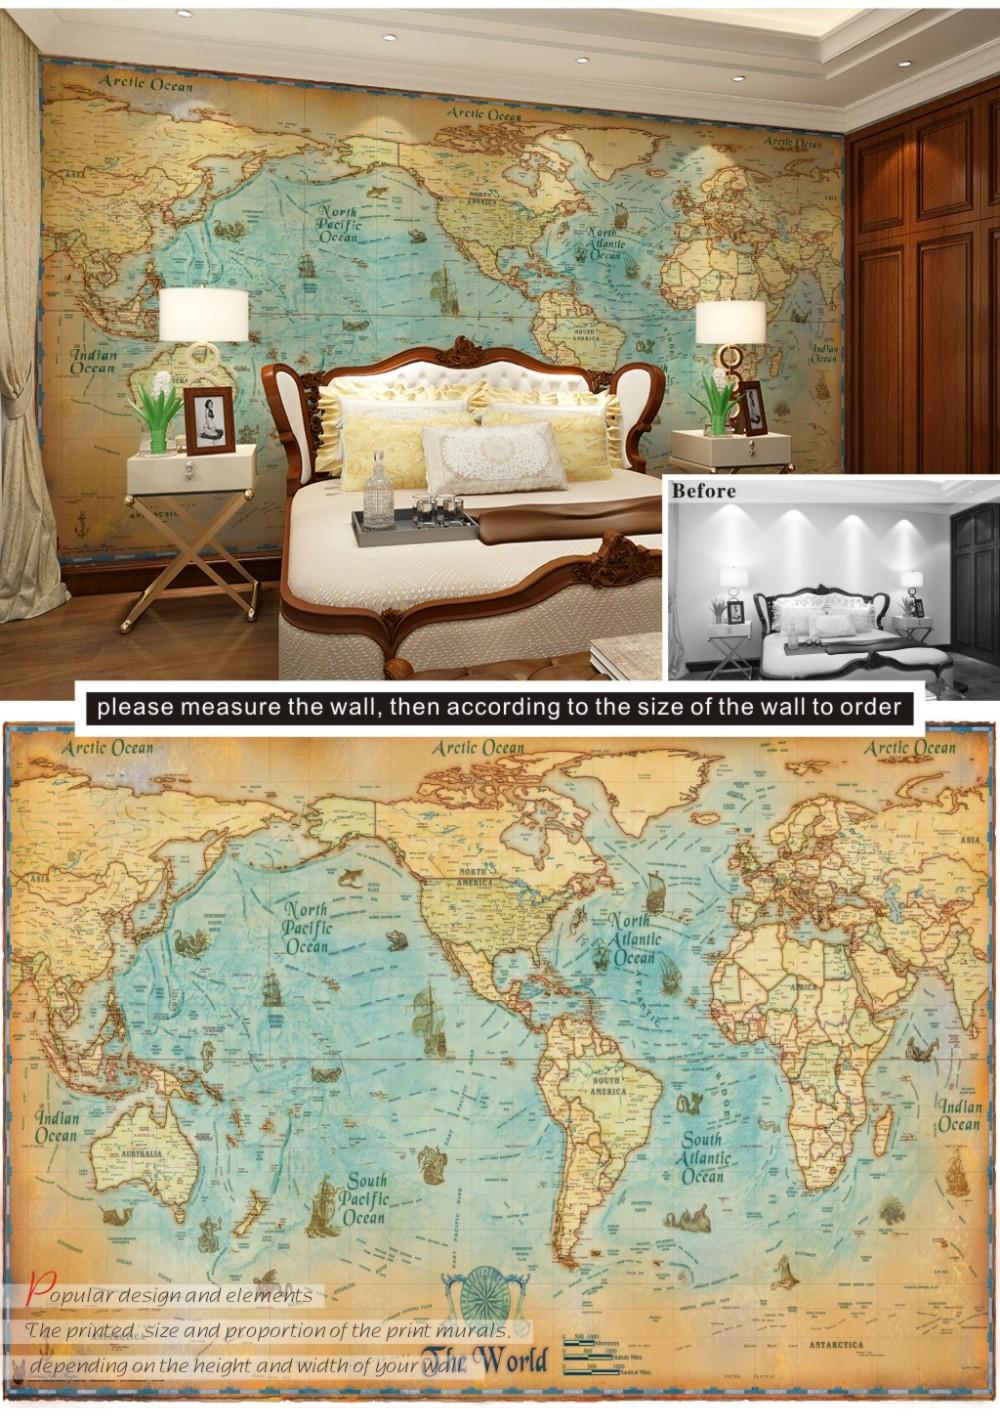 Murals Retro World Map Charts Lobby Bar Living Room Sofa Bedroom TV L Wallpaper Mura Wallpapers Desktop Wallpapers Desktop Background From